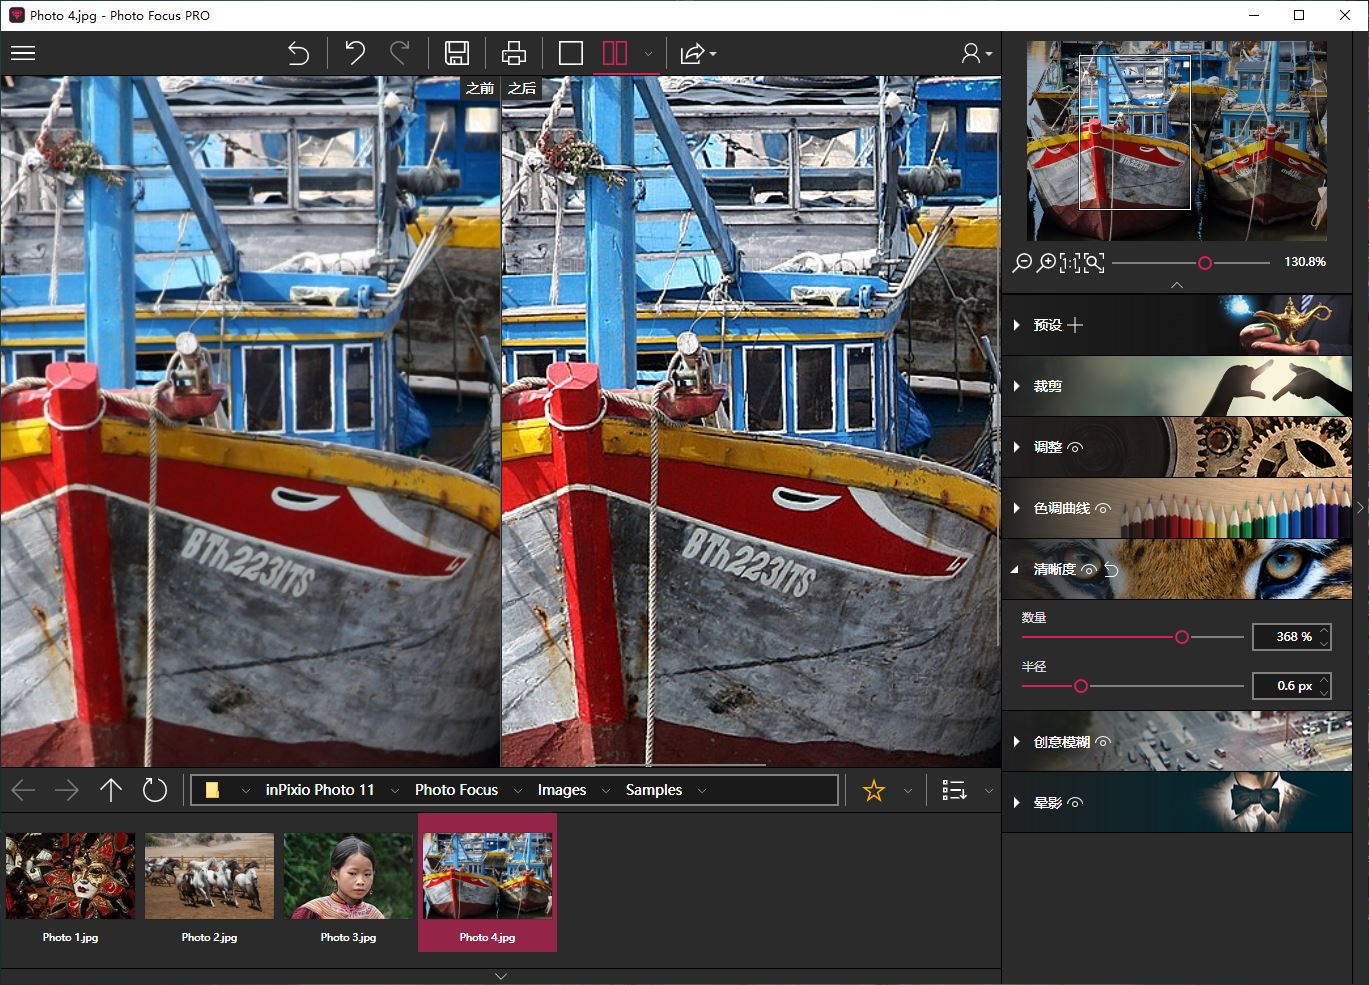 VIP资源-图像编辑软件套装InPixio Photo Studio 11.0.7709.20526 中文汉化版(3)